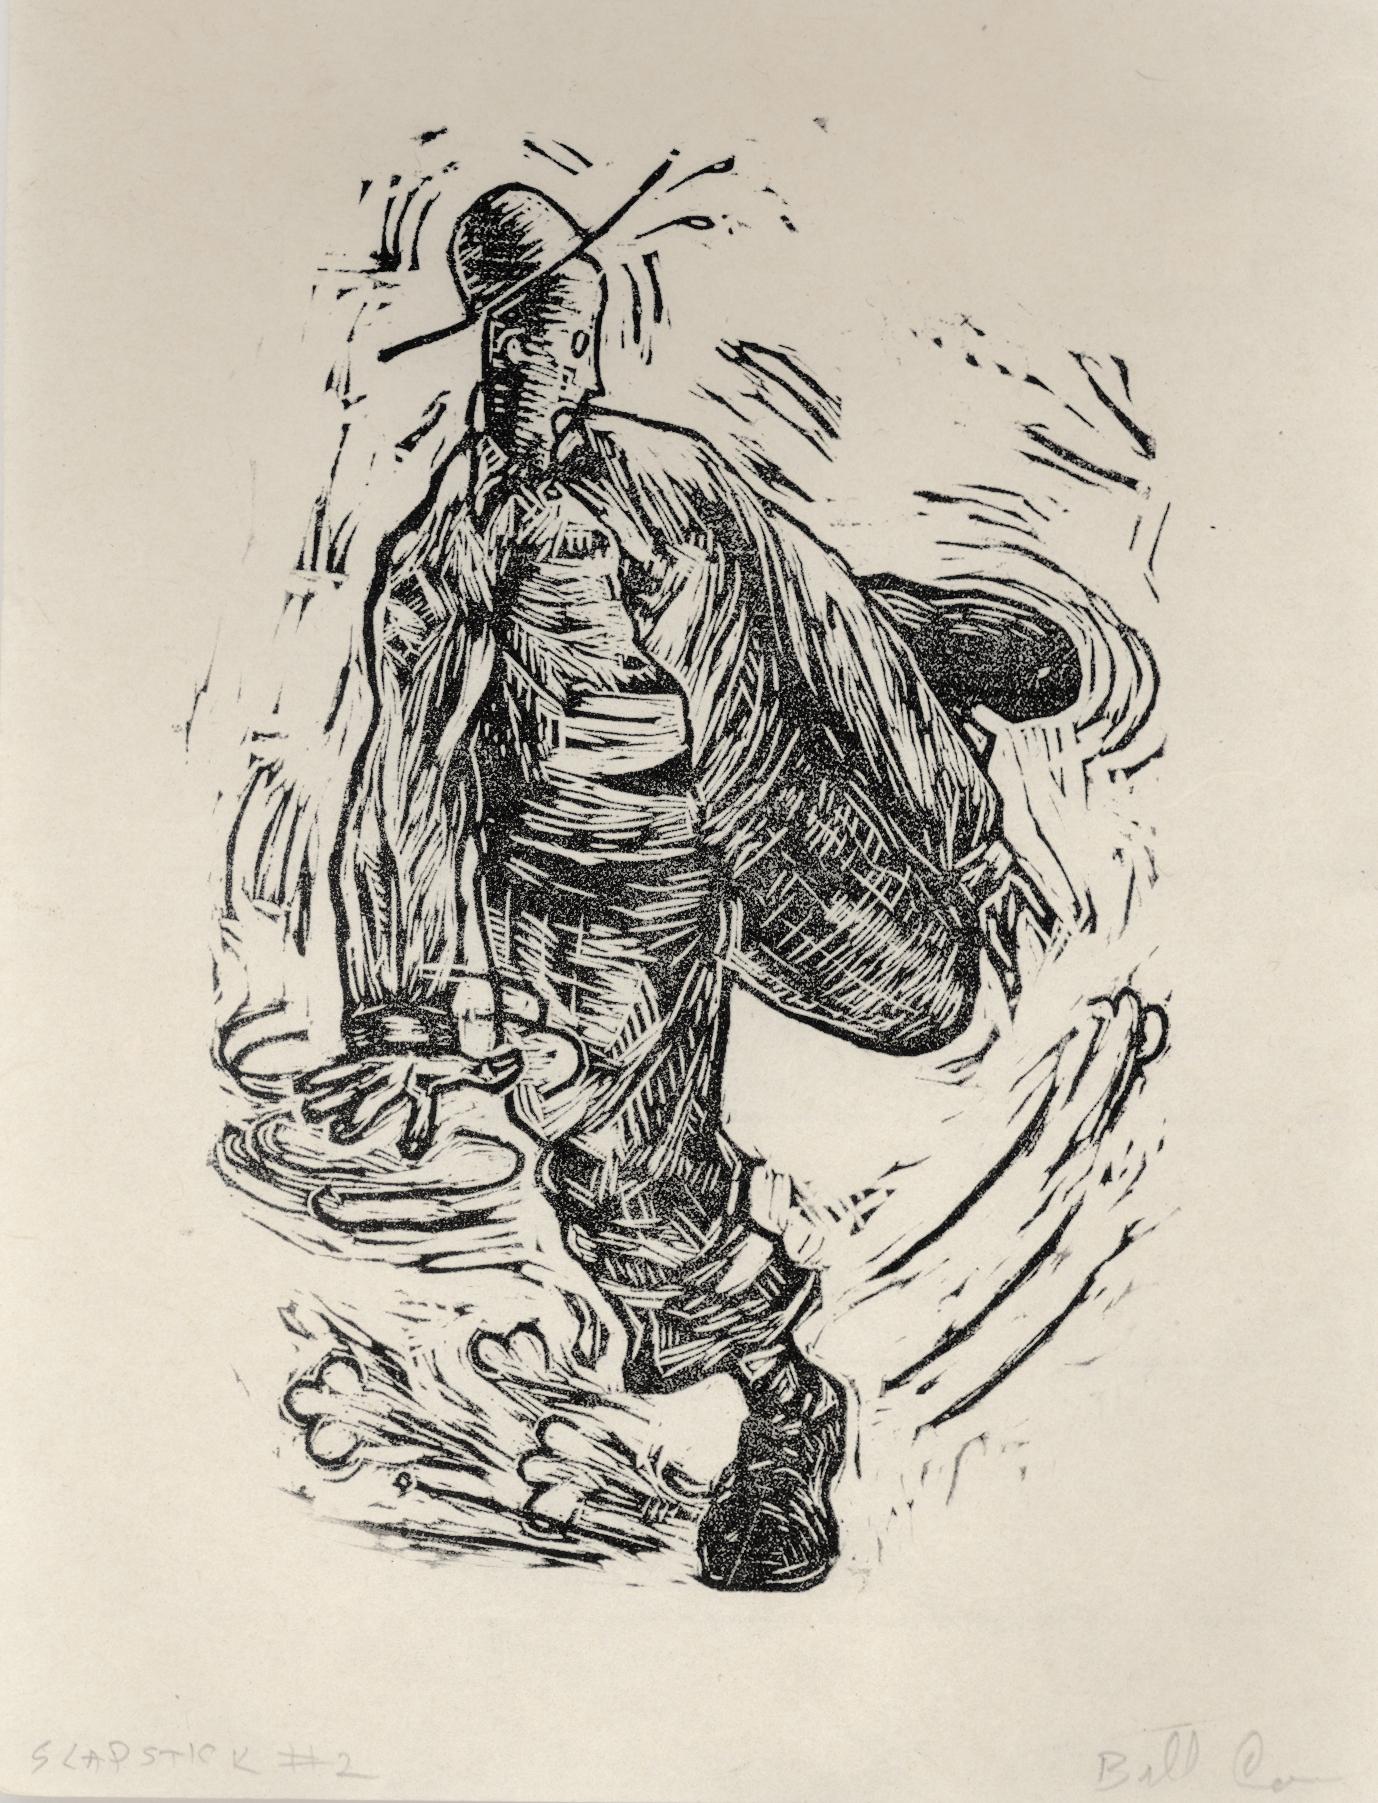 Bill Cass  Slapstick Series #2  Woodblock prints